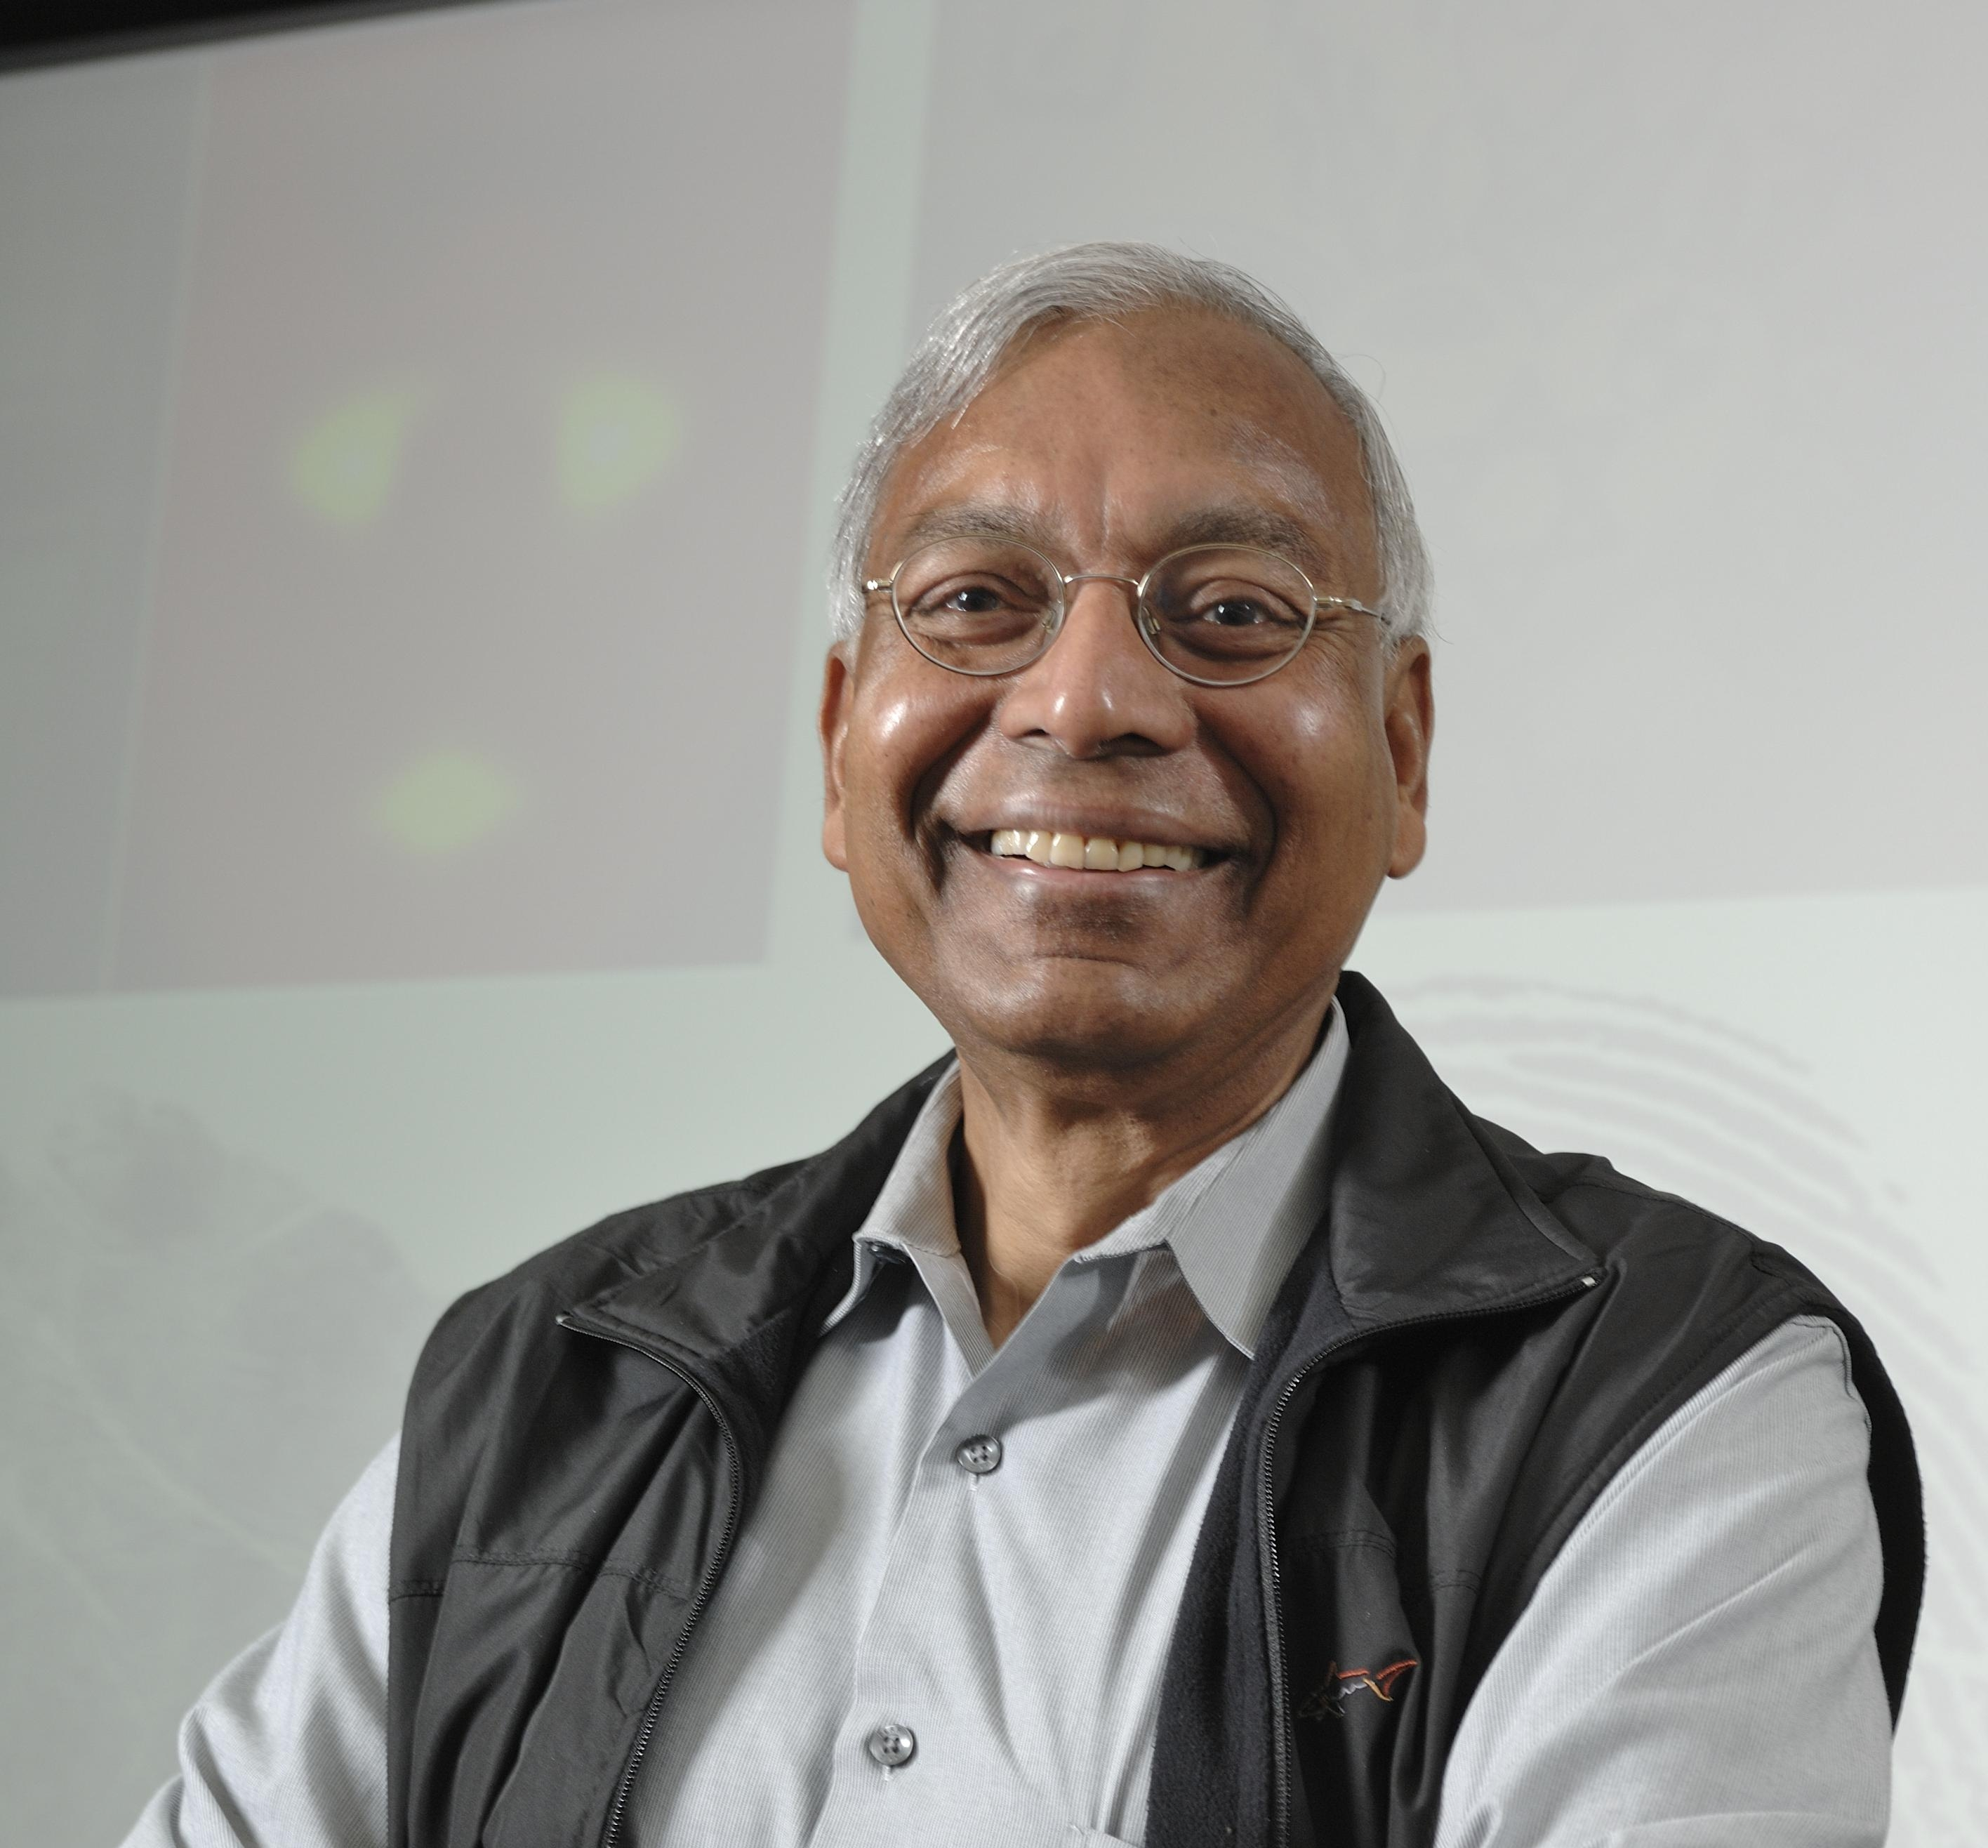 Anil K. Jain